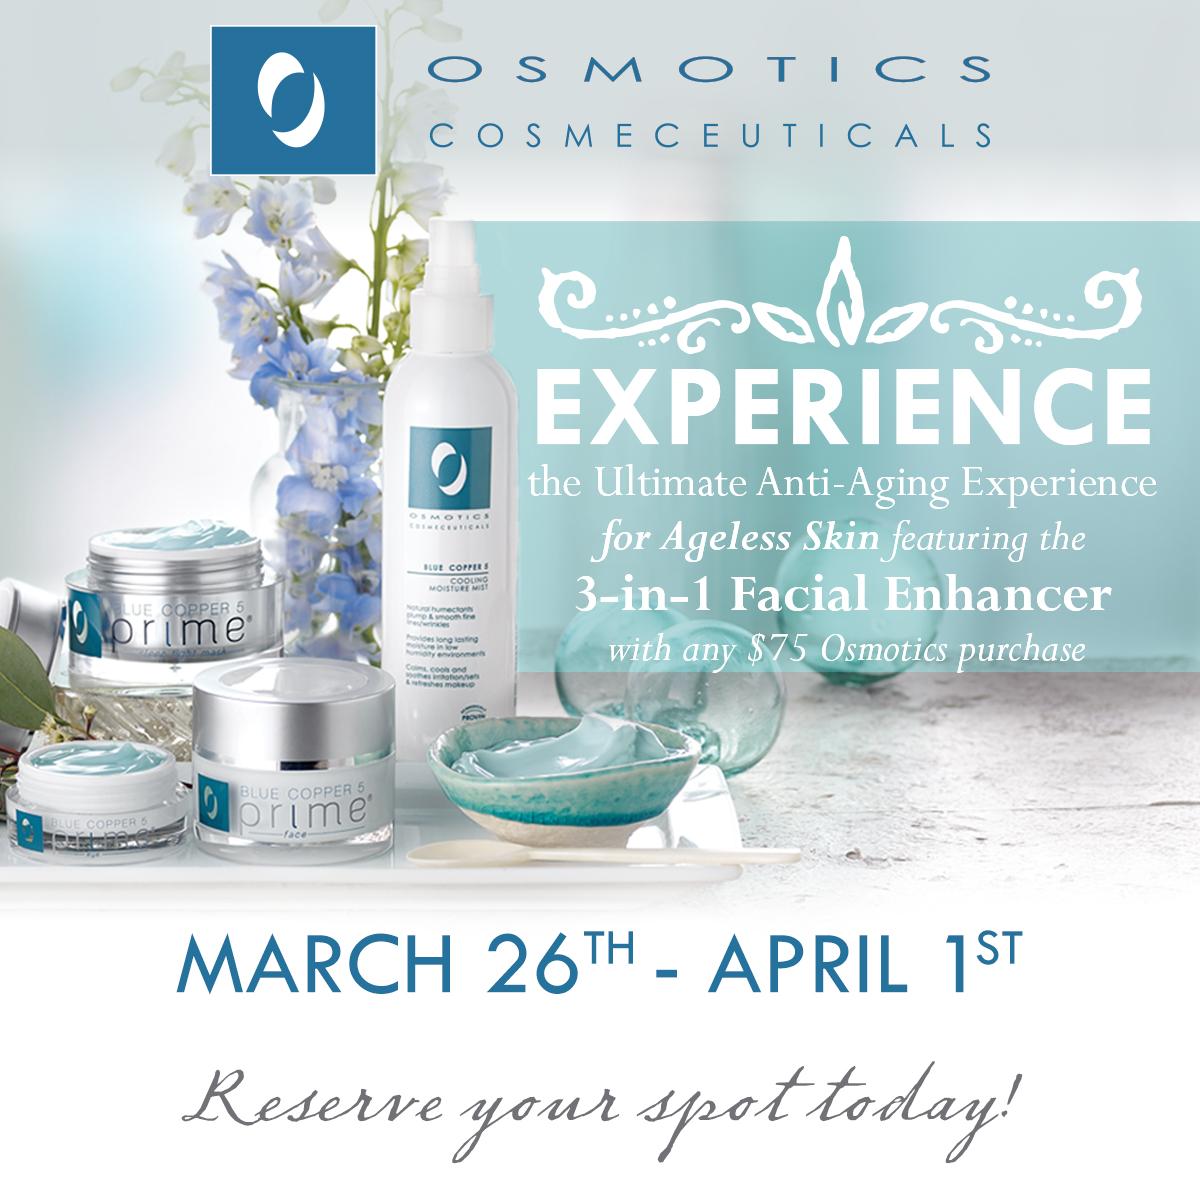 Osmotics Beauty Event